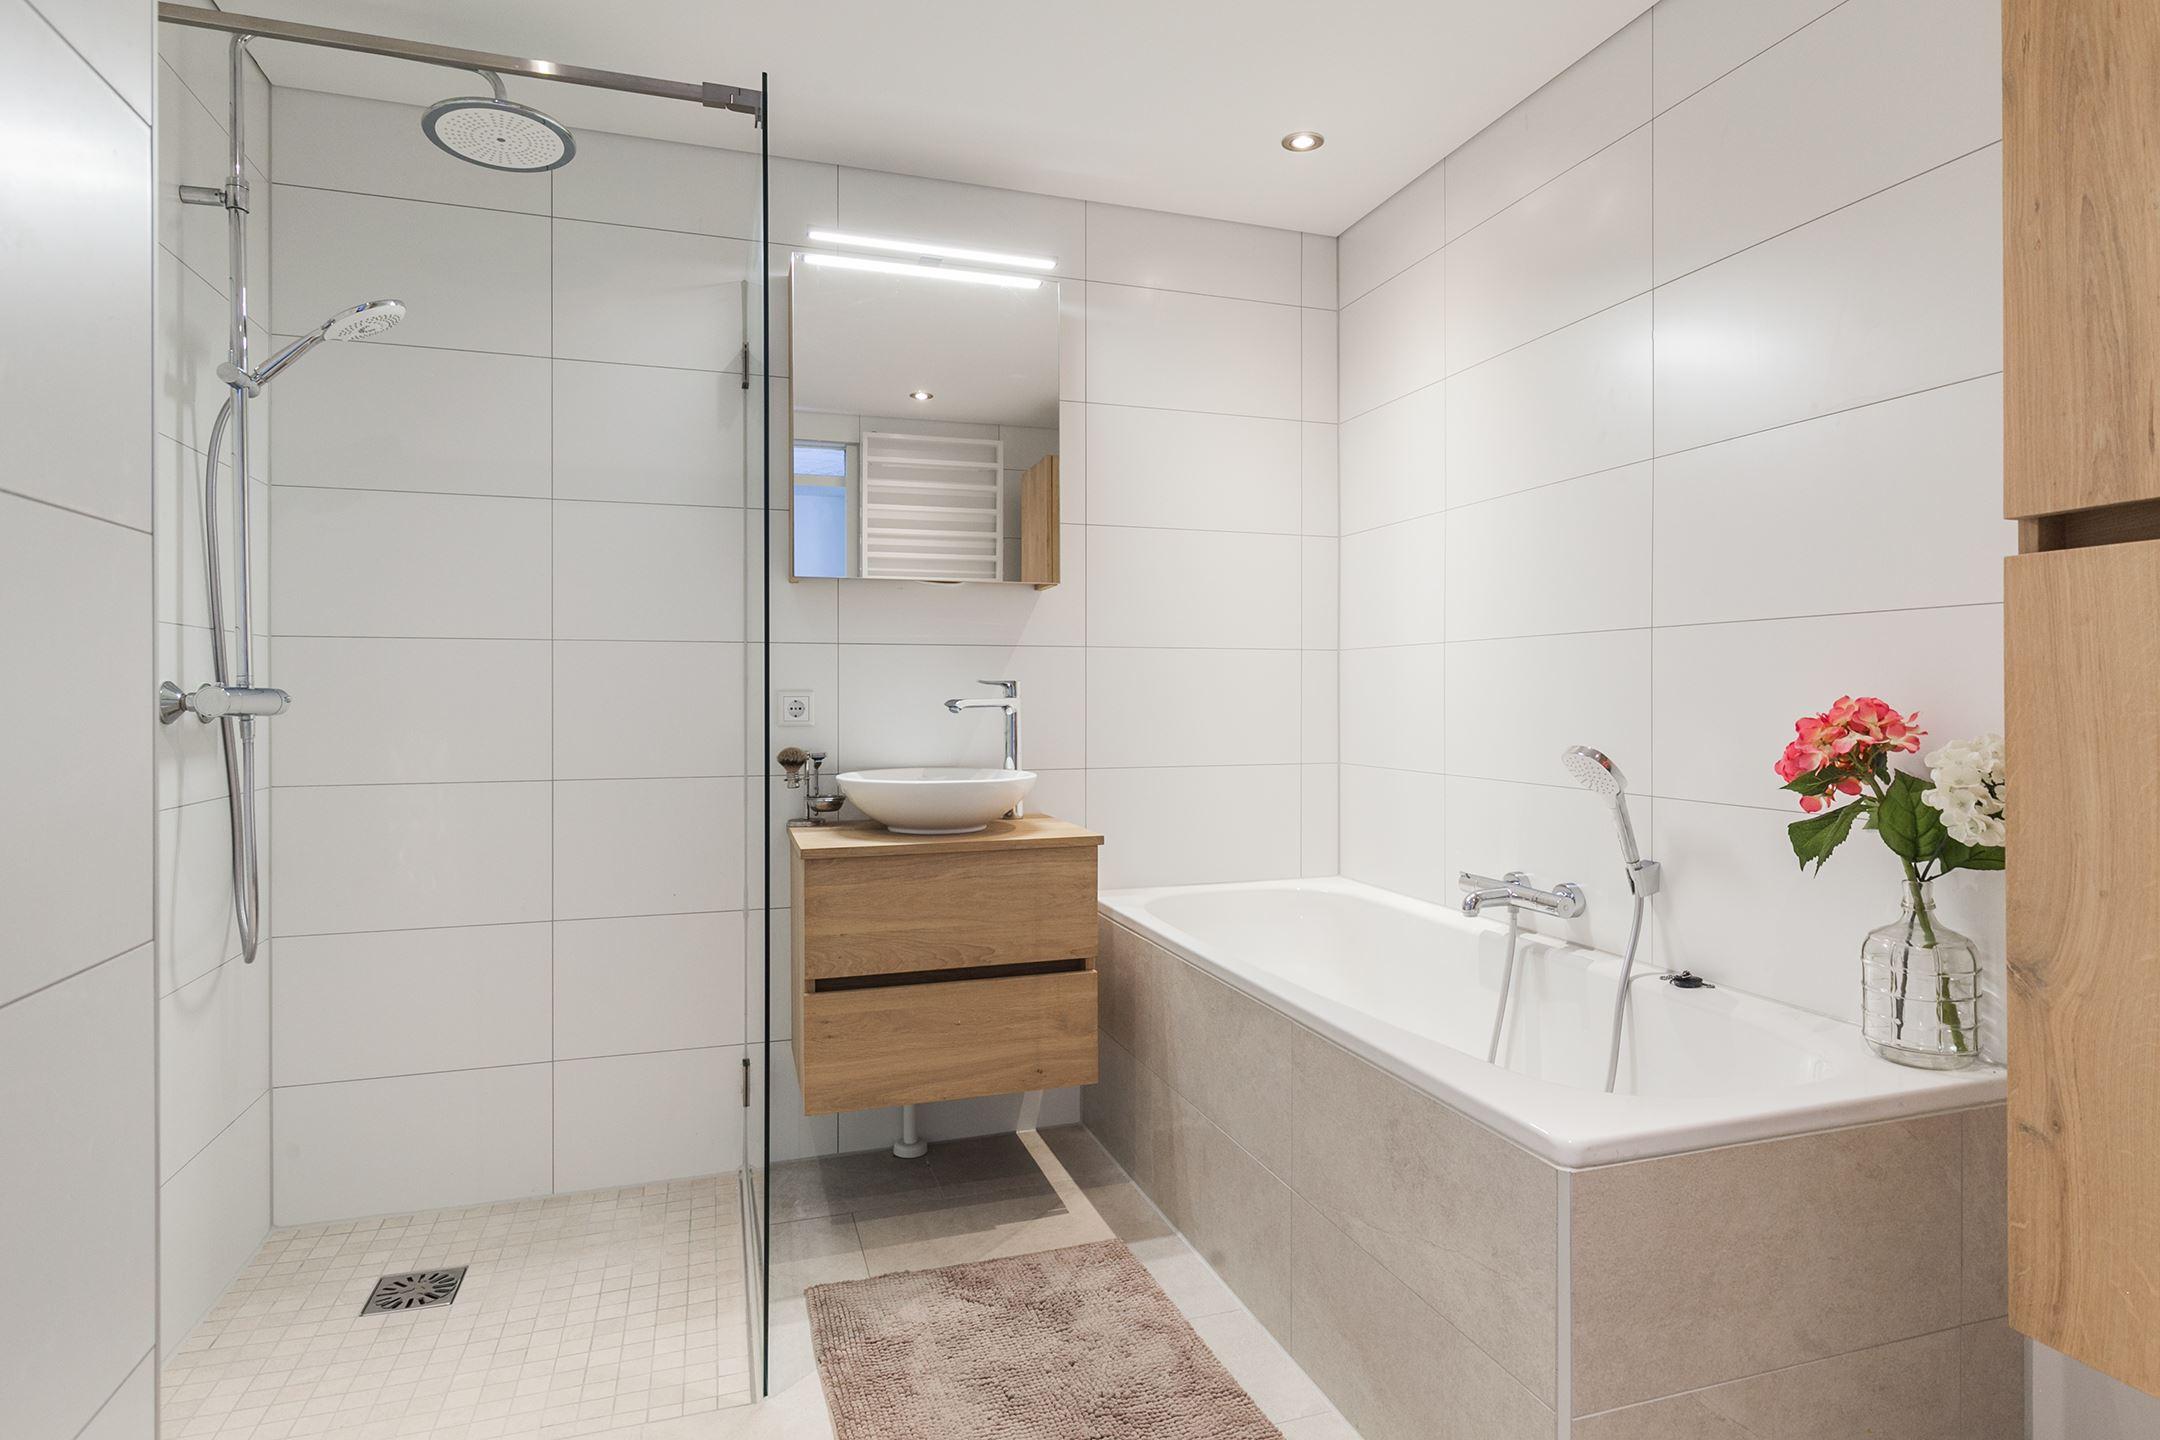 Nieuwe Badkamer Enschede : Woning te koop tolstraat cg enschede vbo makelaar